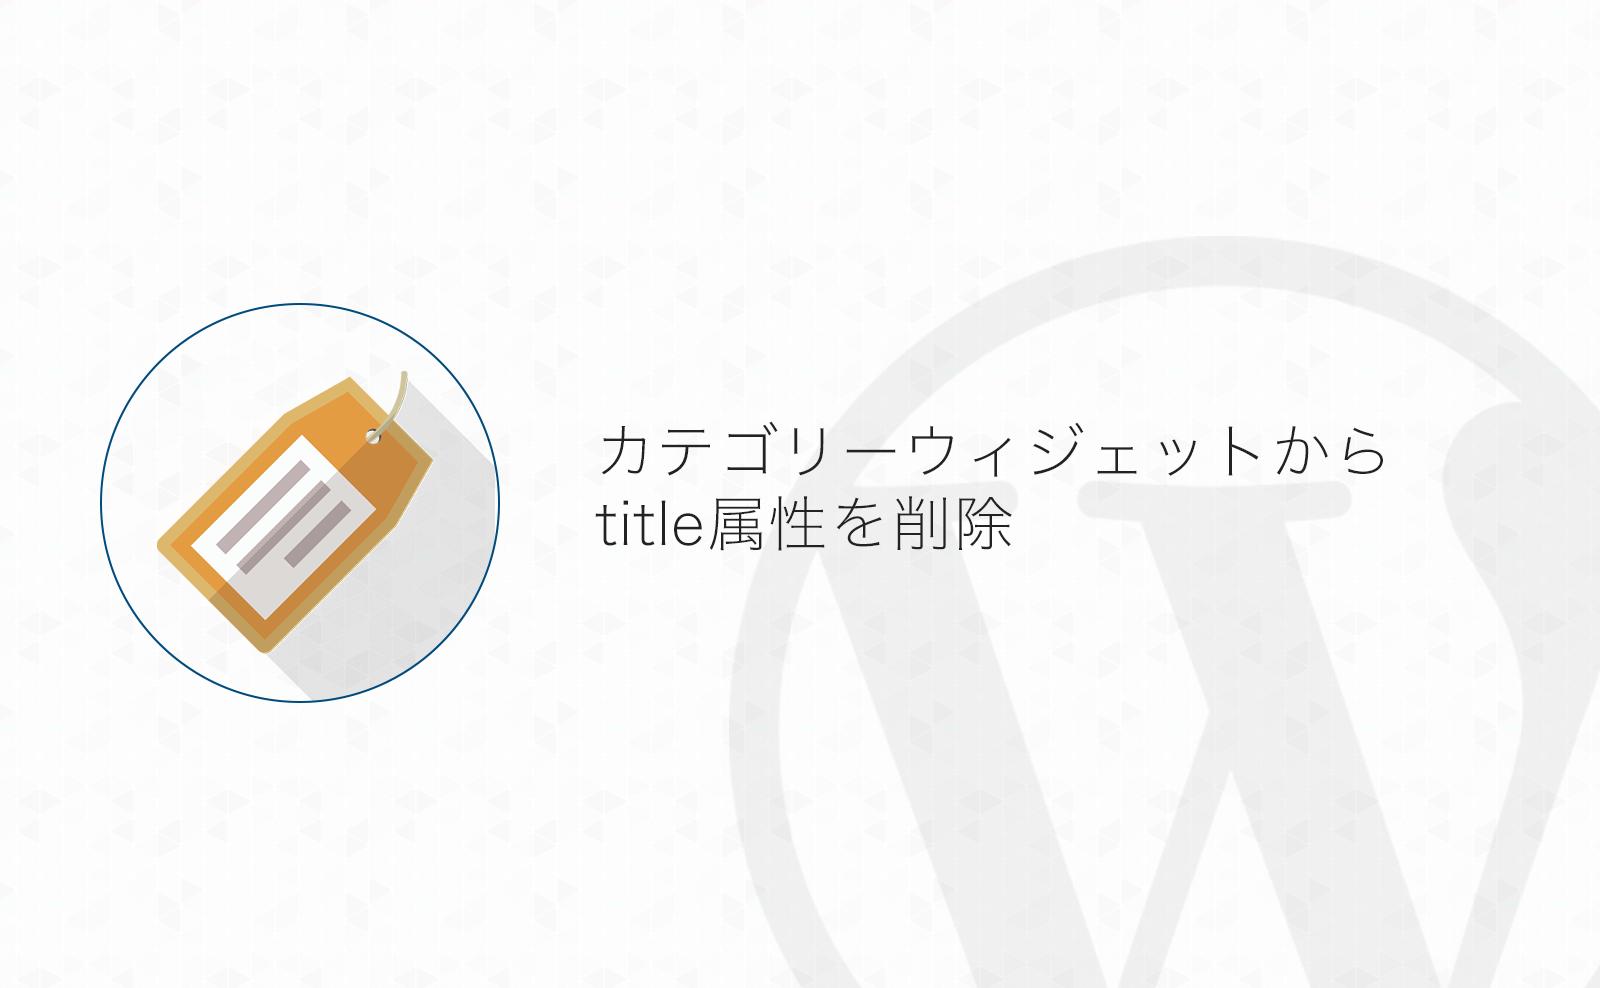 【WordPress】カテゴリーウィジェットのリンクからtitle属性を削除する方法